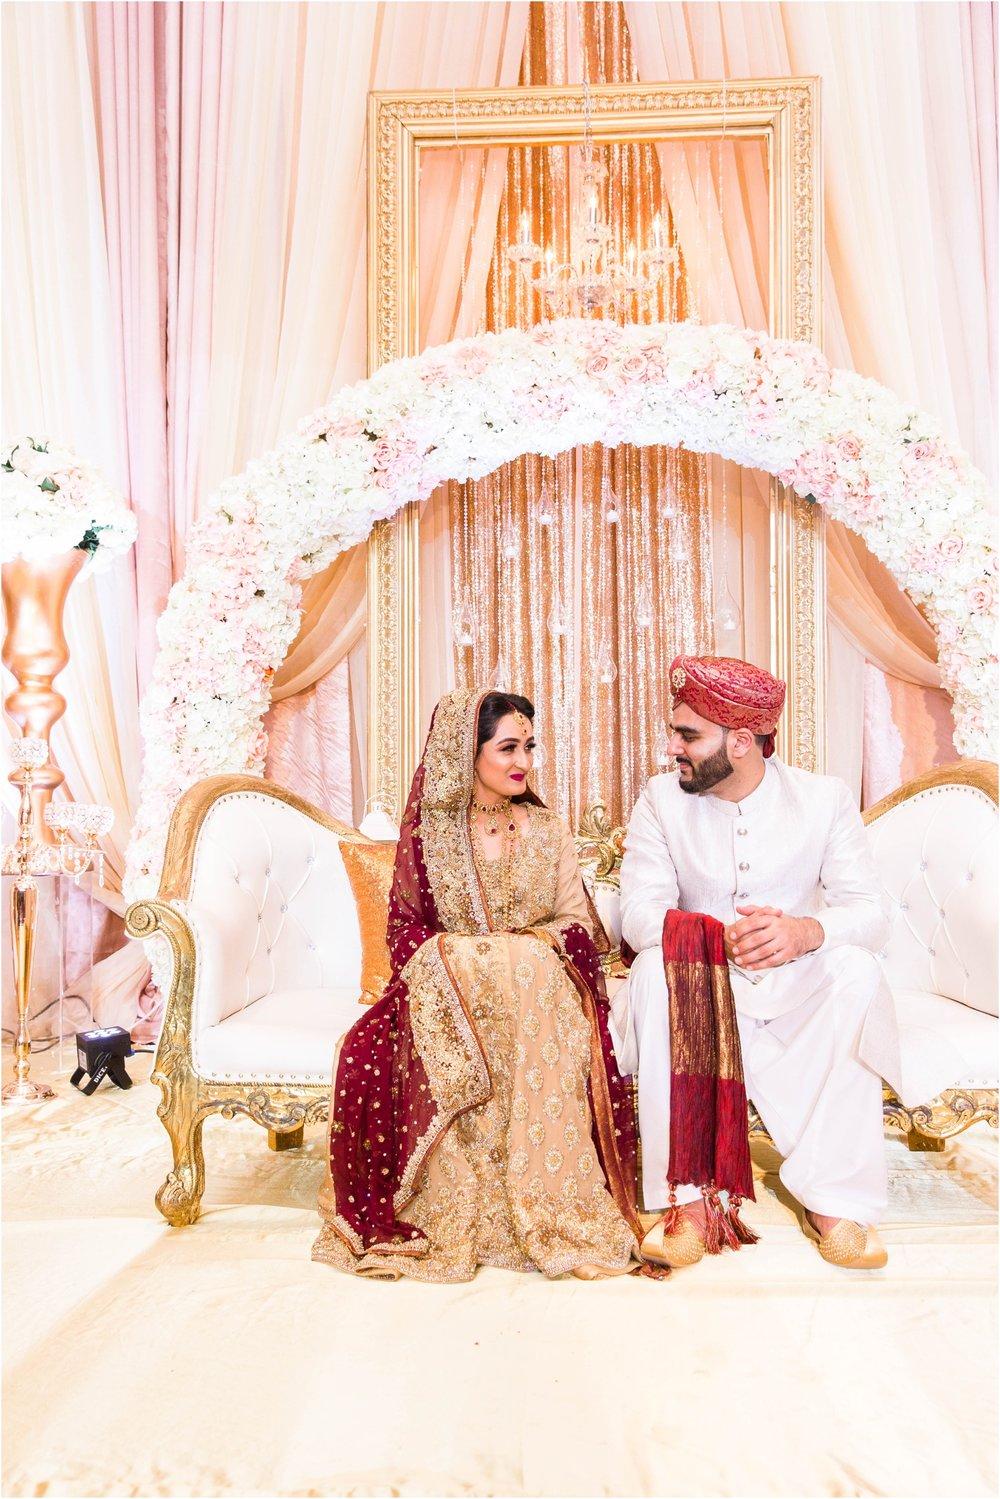 Scarborough-Convention-Centre-Baraat-Toronto-Mississauga-Brampton-Scarborough-GTA-Pakistani-Indian-Wedding-Engagement-Photographer-Photography_0023.jpg